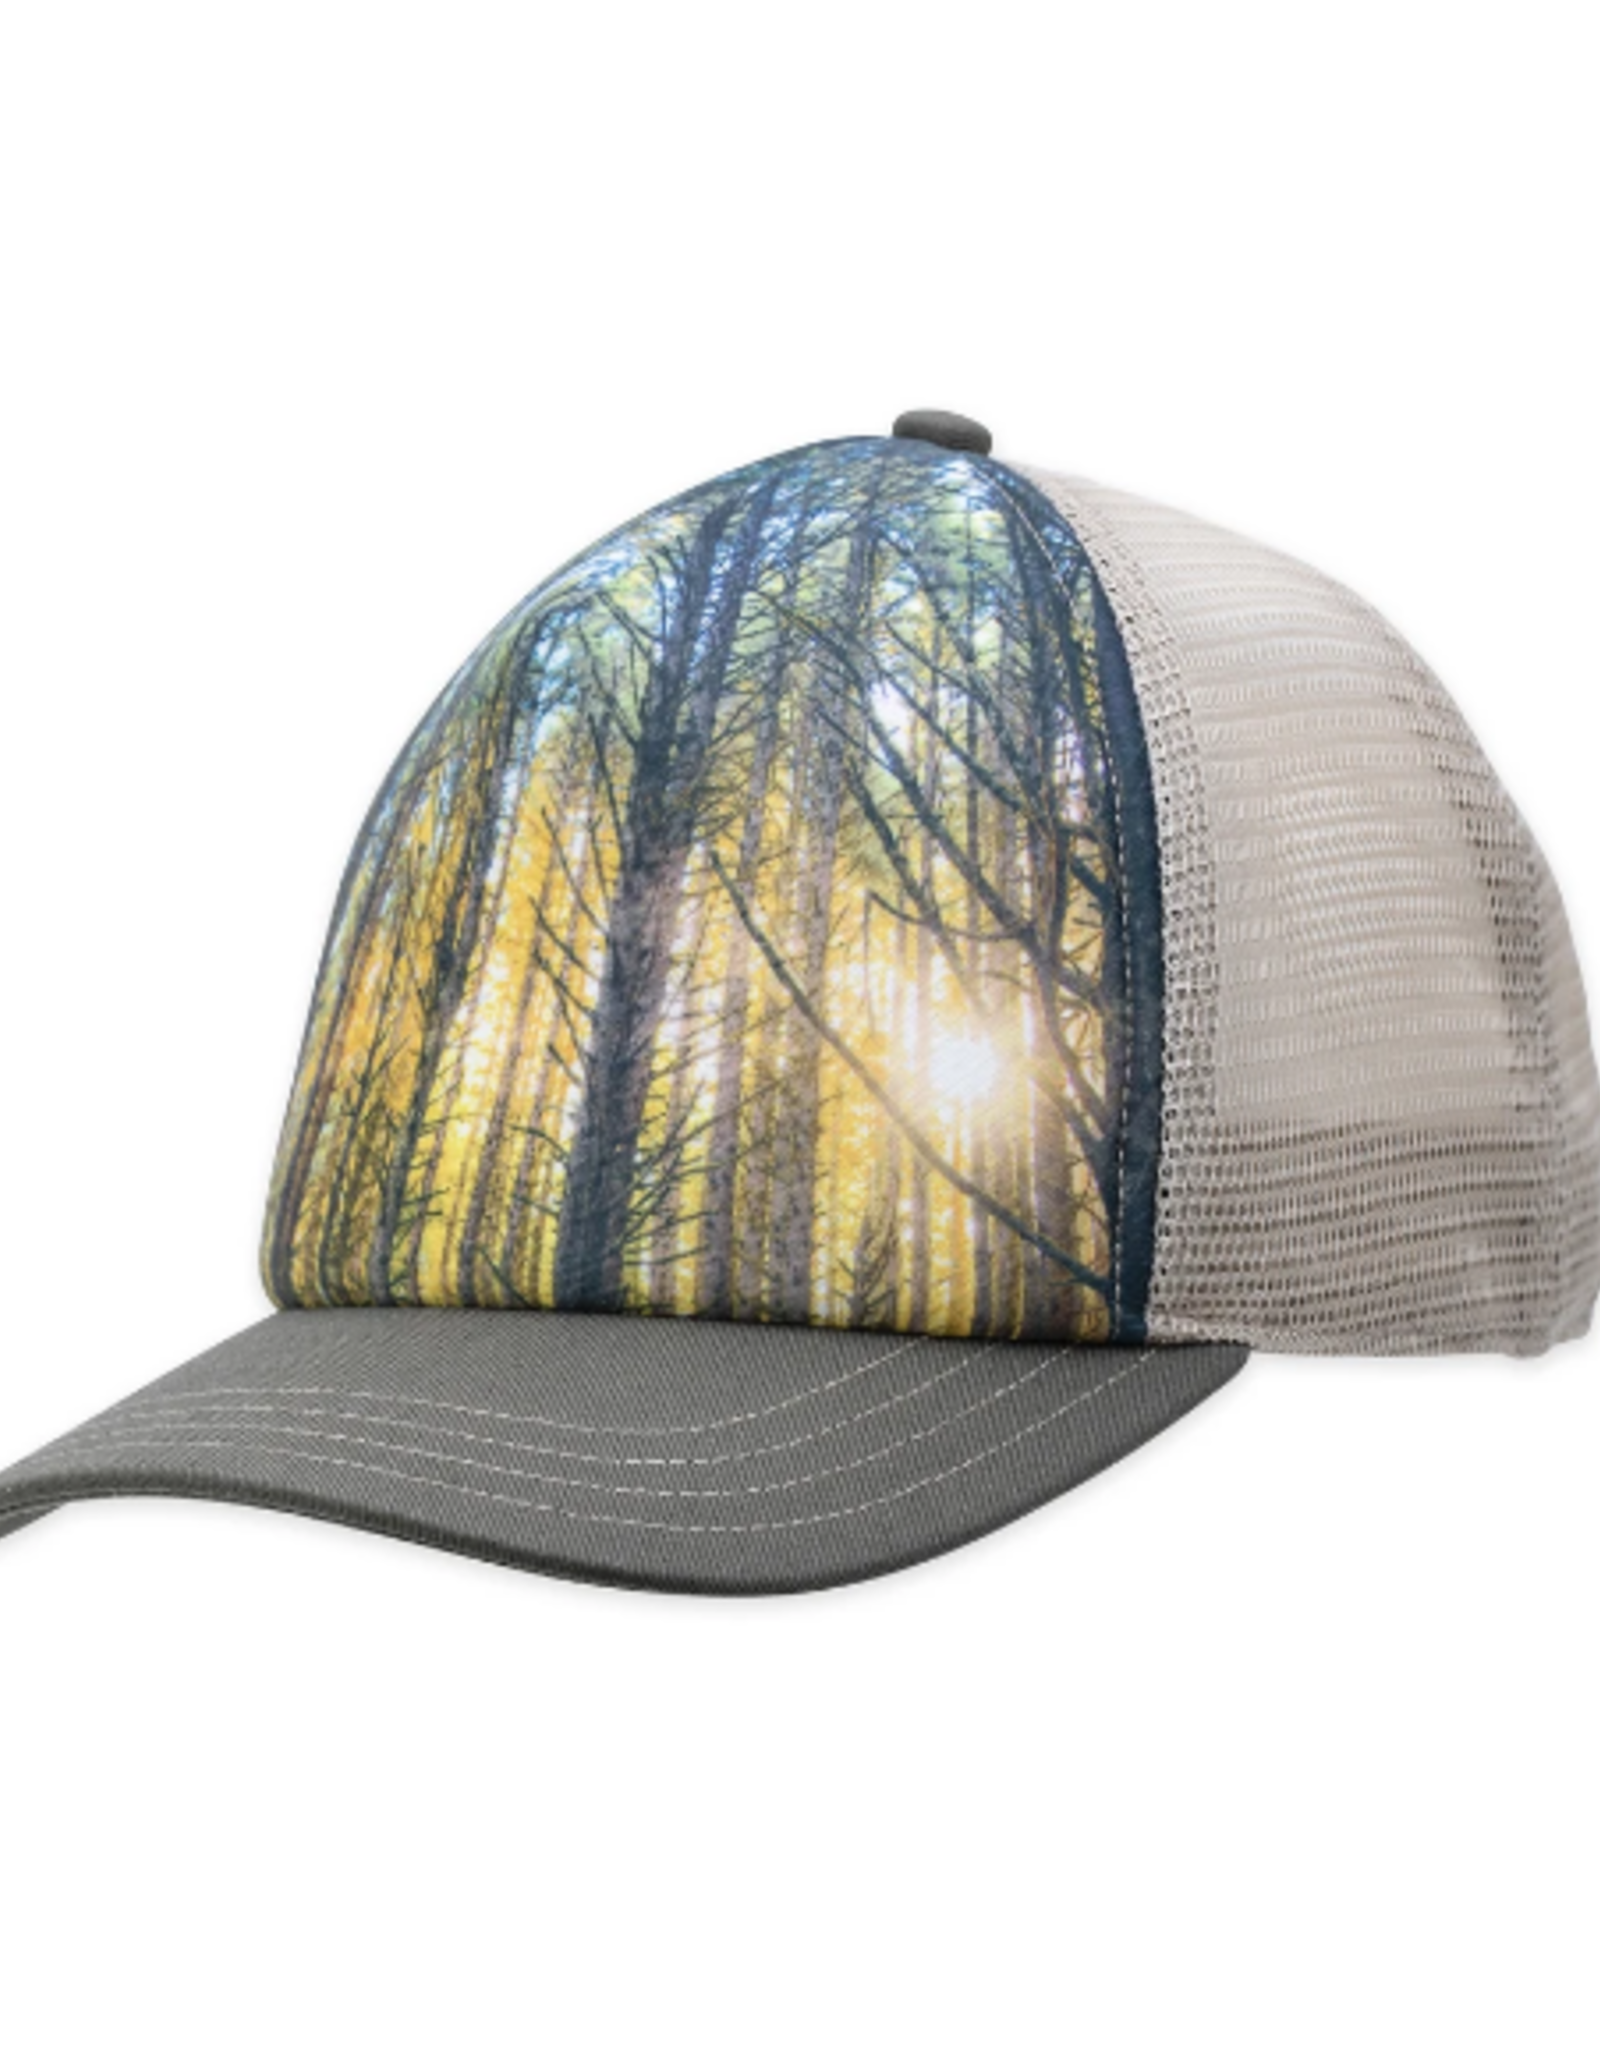 HAT TRUCKER CAP DUSK PRINTED NATURE SCENE OLIVE GREEN